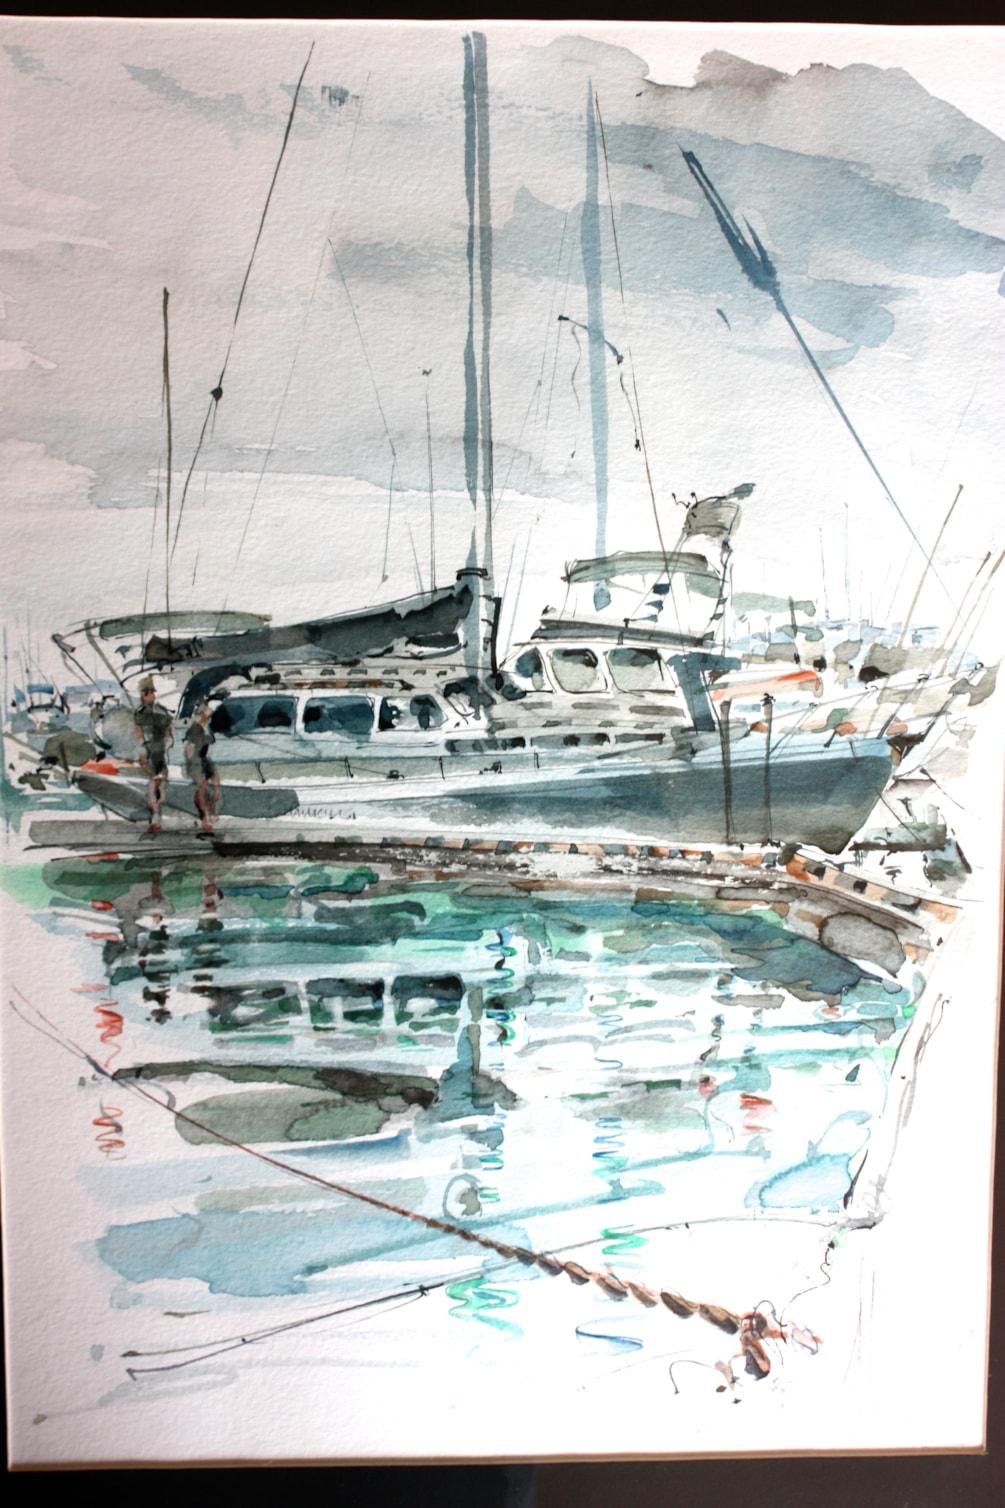 Bucklands Beach, Half Moon Bay Marina. Friends Boat